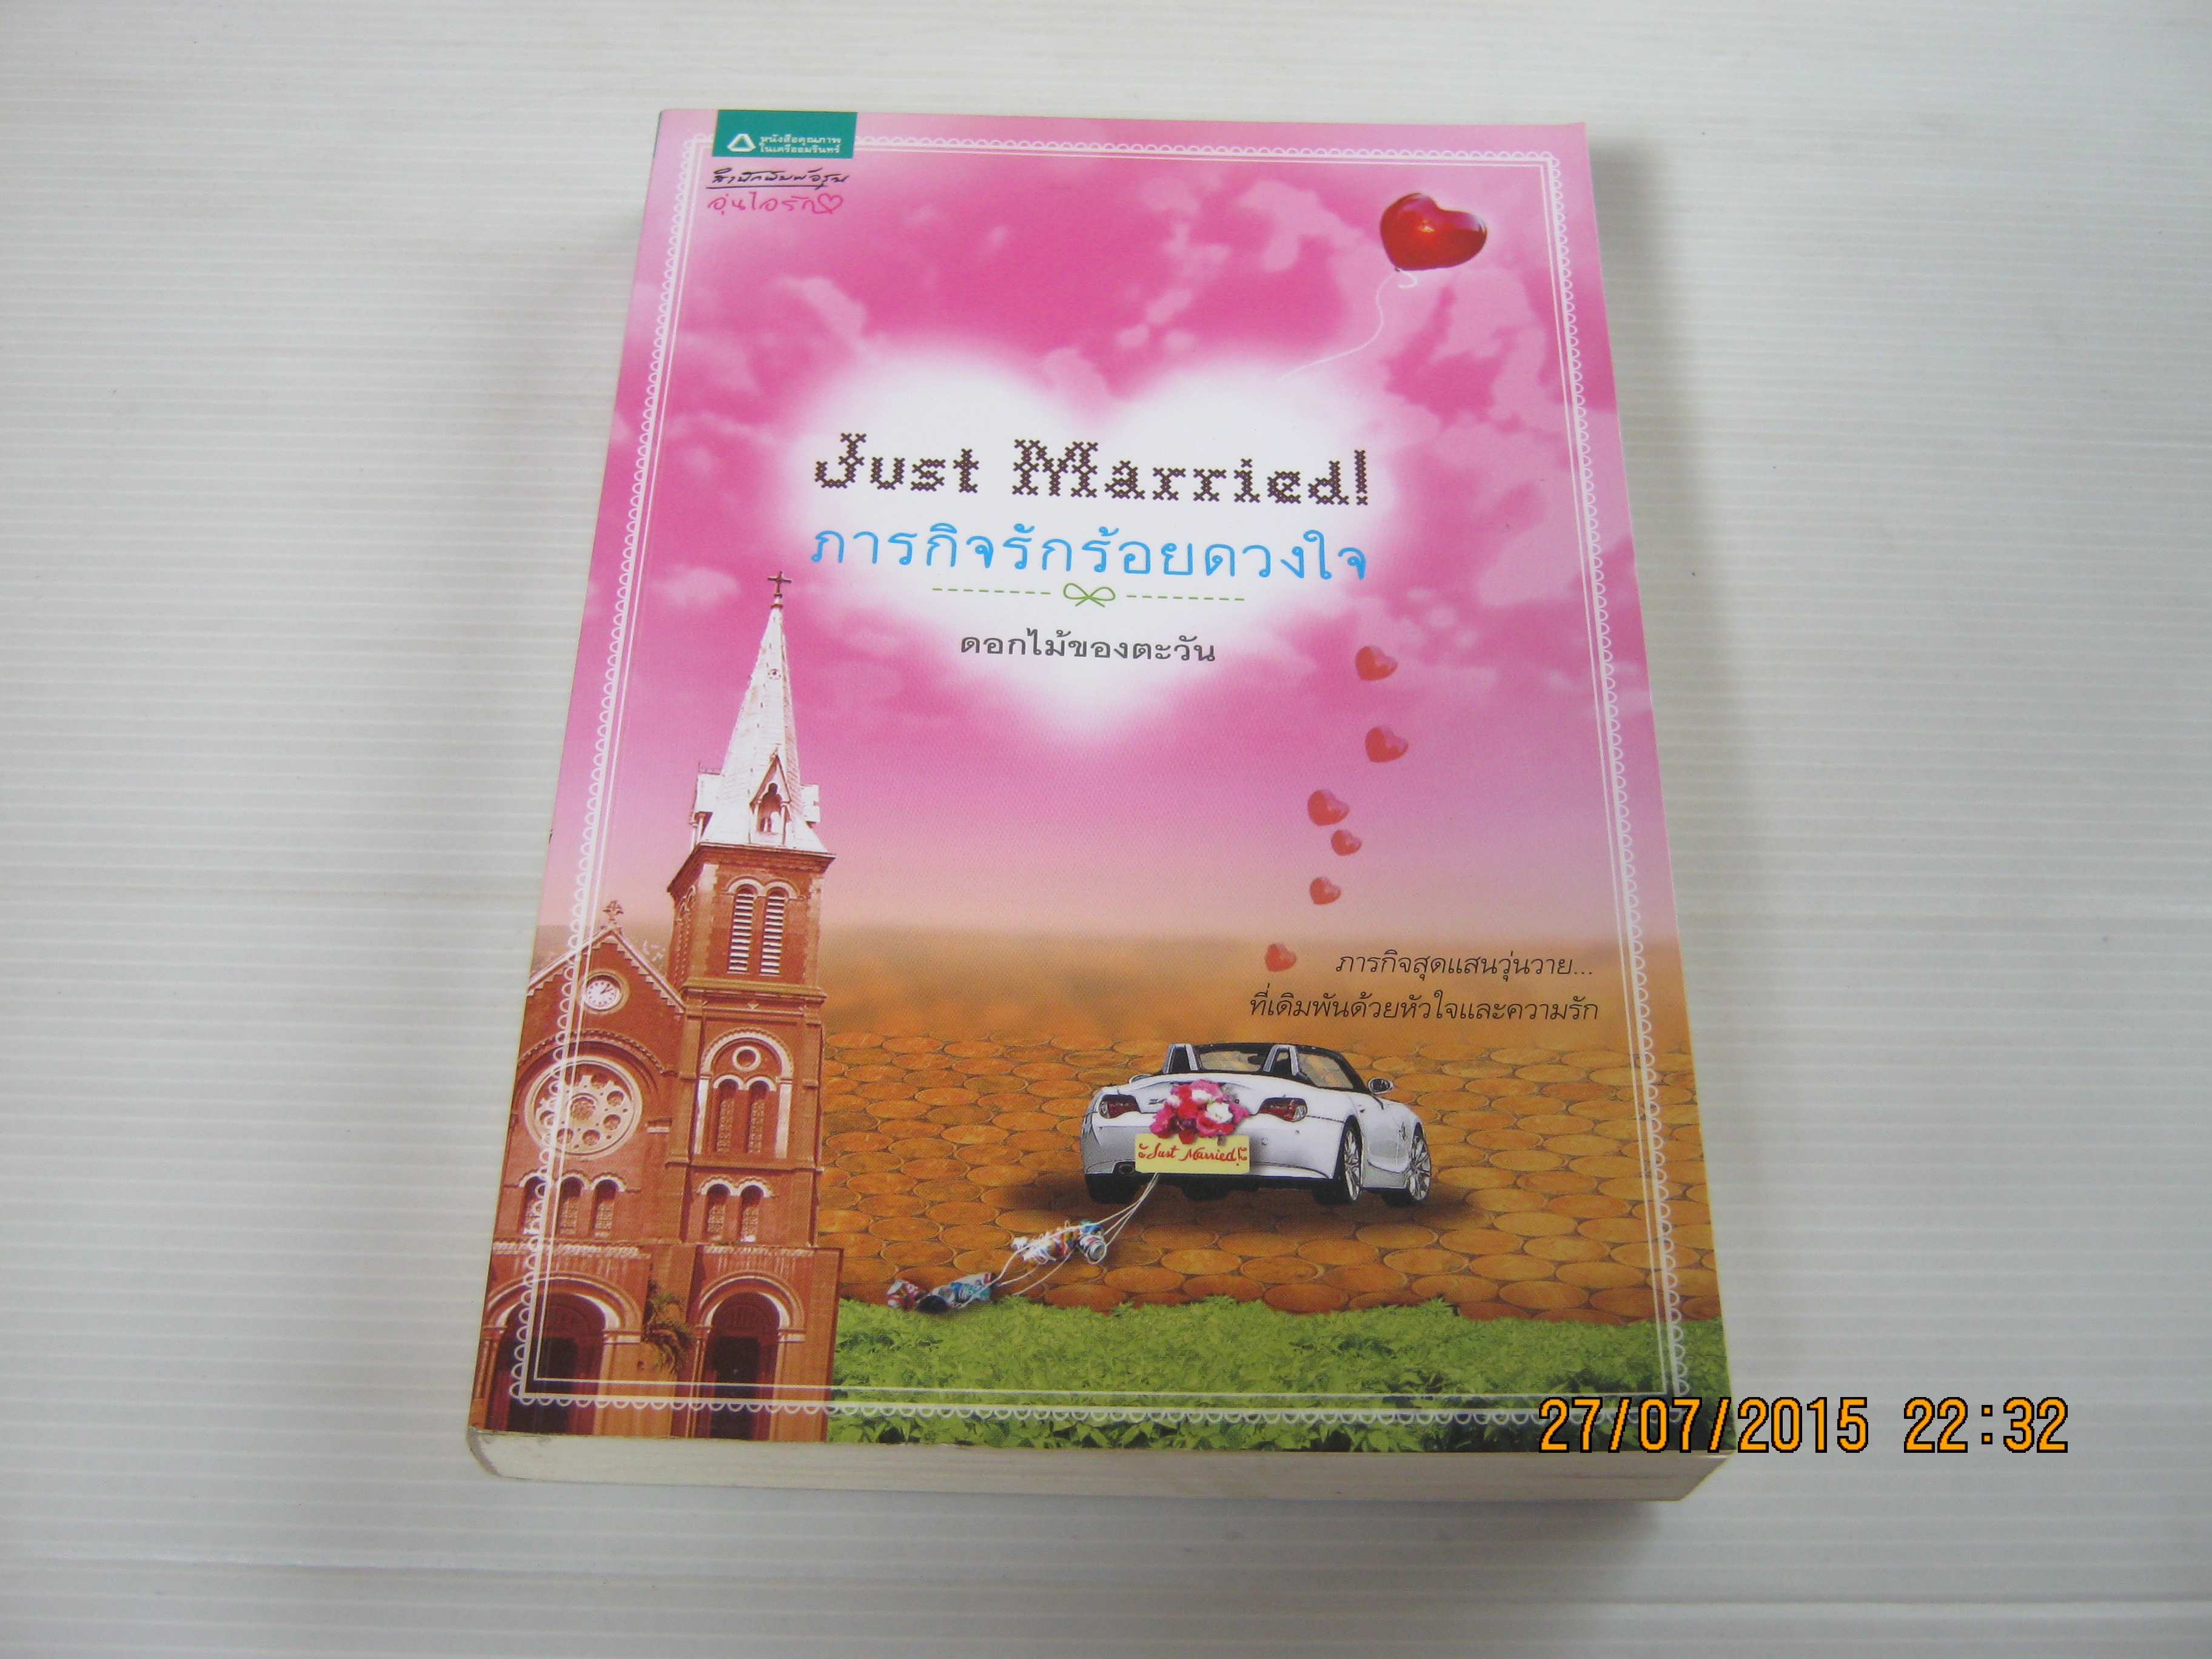 Just Married! ภารกิจร้อยดวงใจ ดอกไม้ของตะวัน เขียน